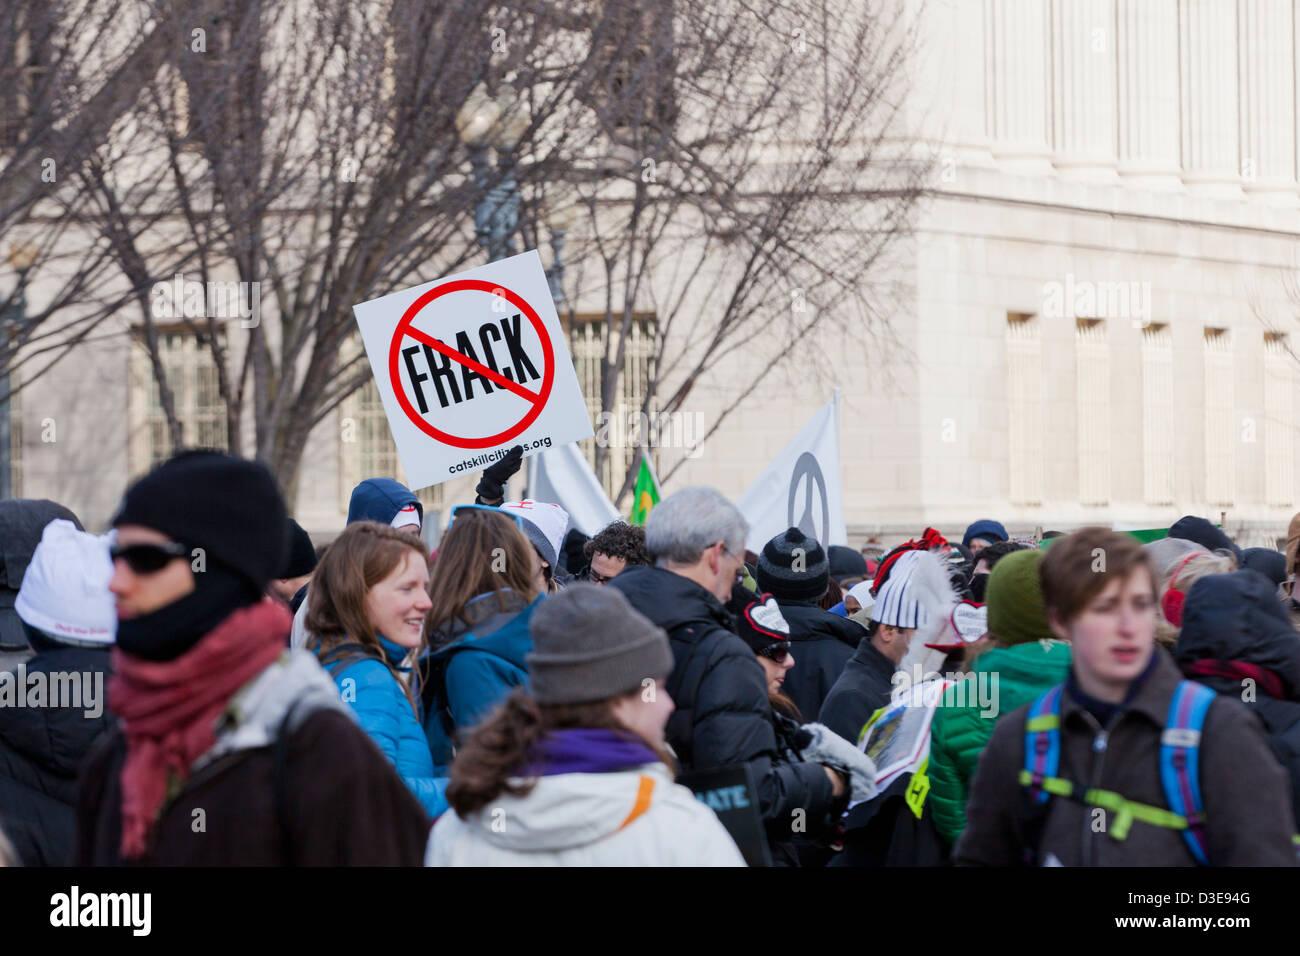 Environmental activists protesting fracking - Stock Image